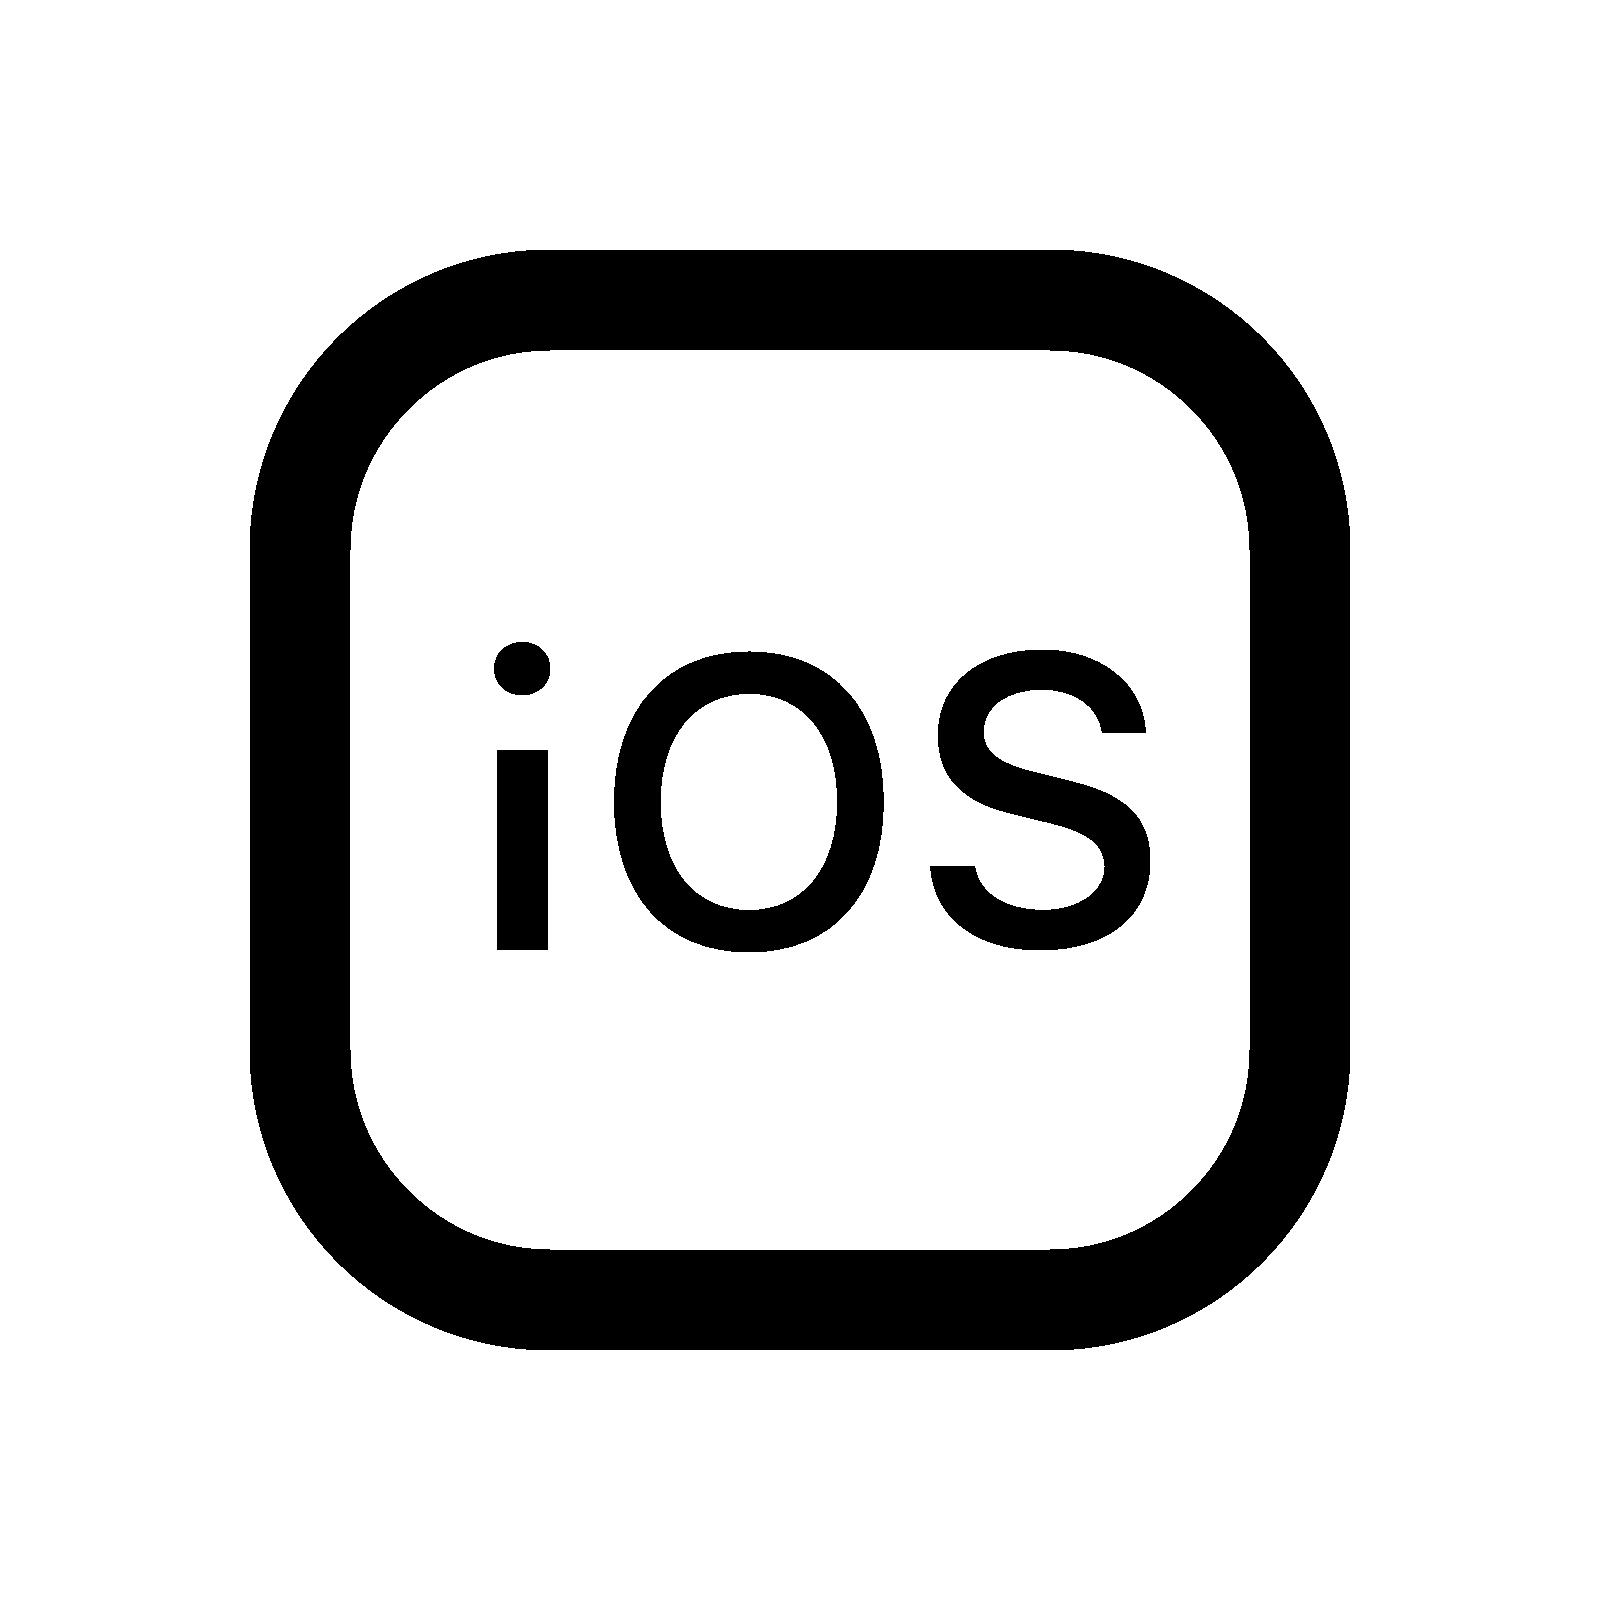 Apple Ios Logo PNG - 31883